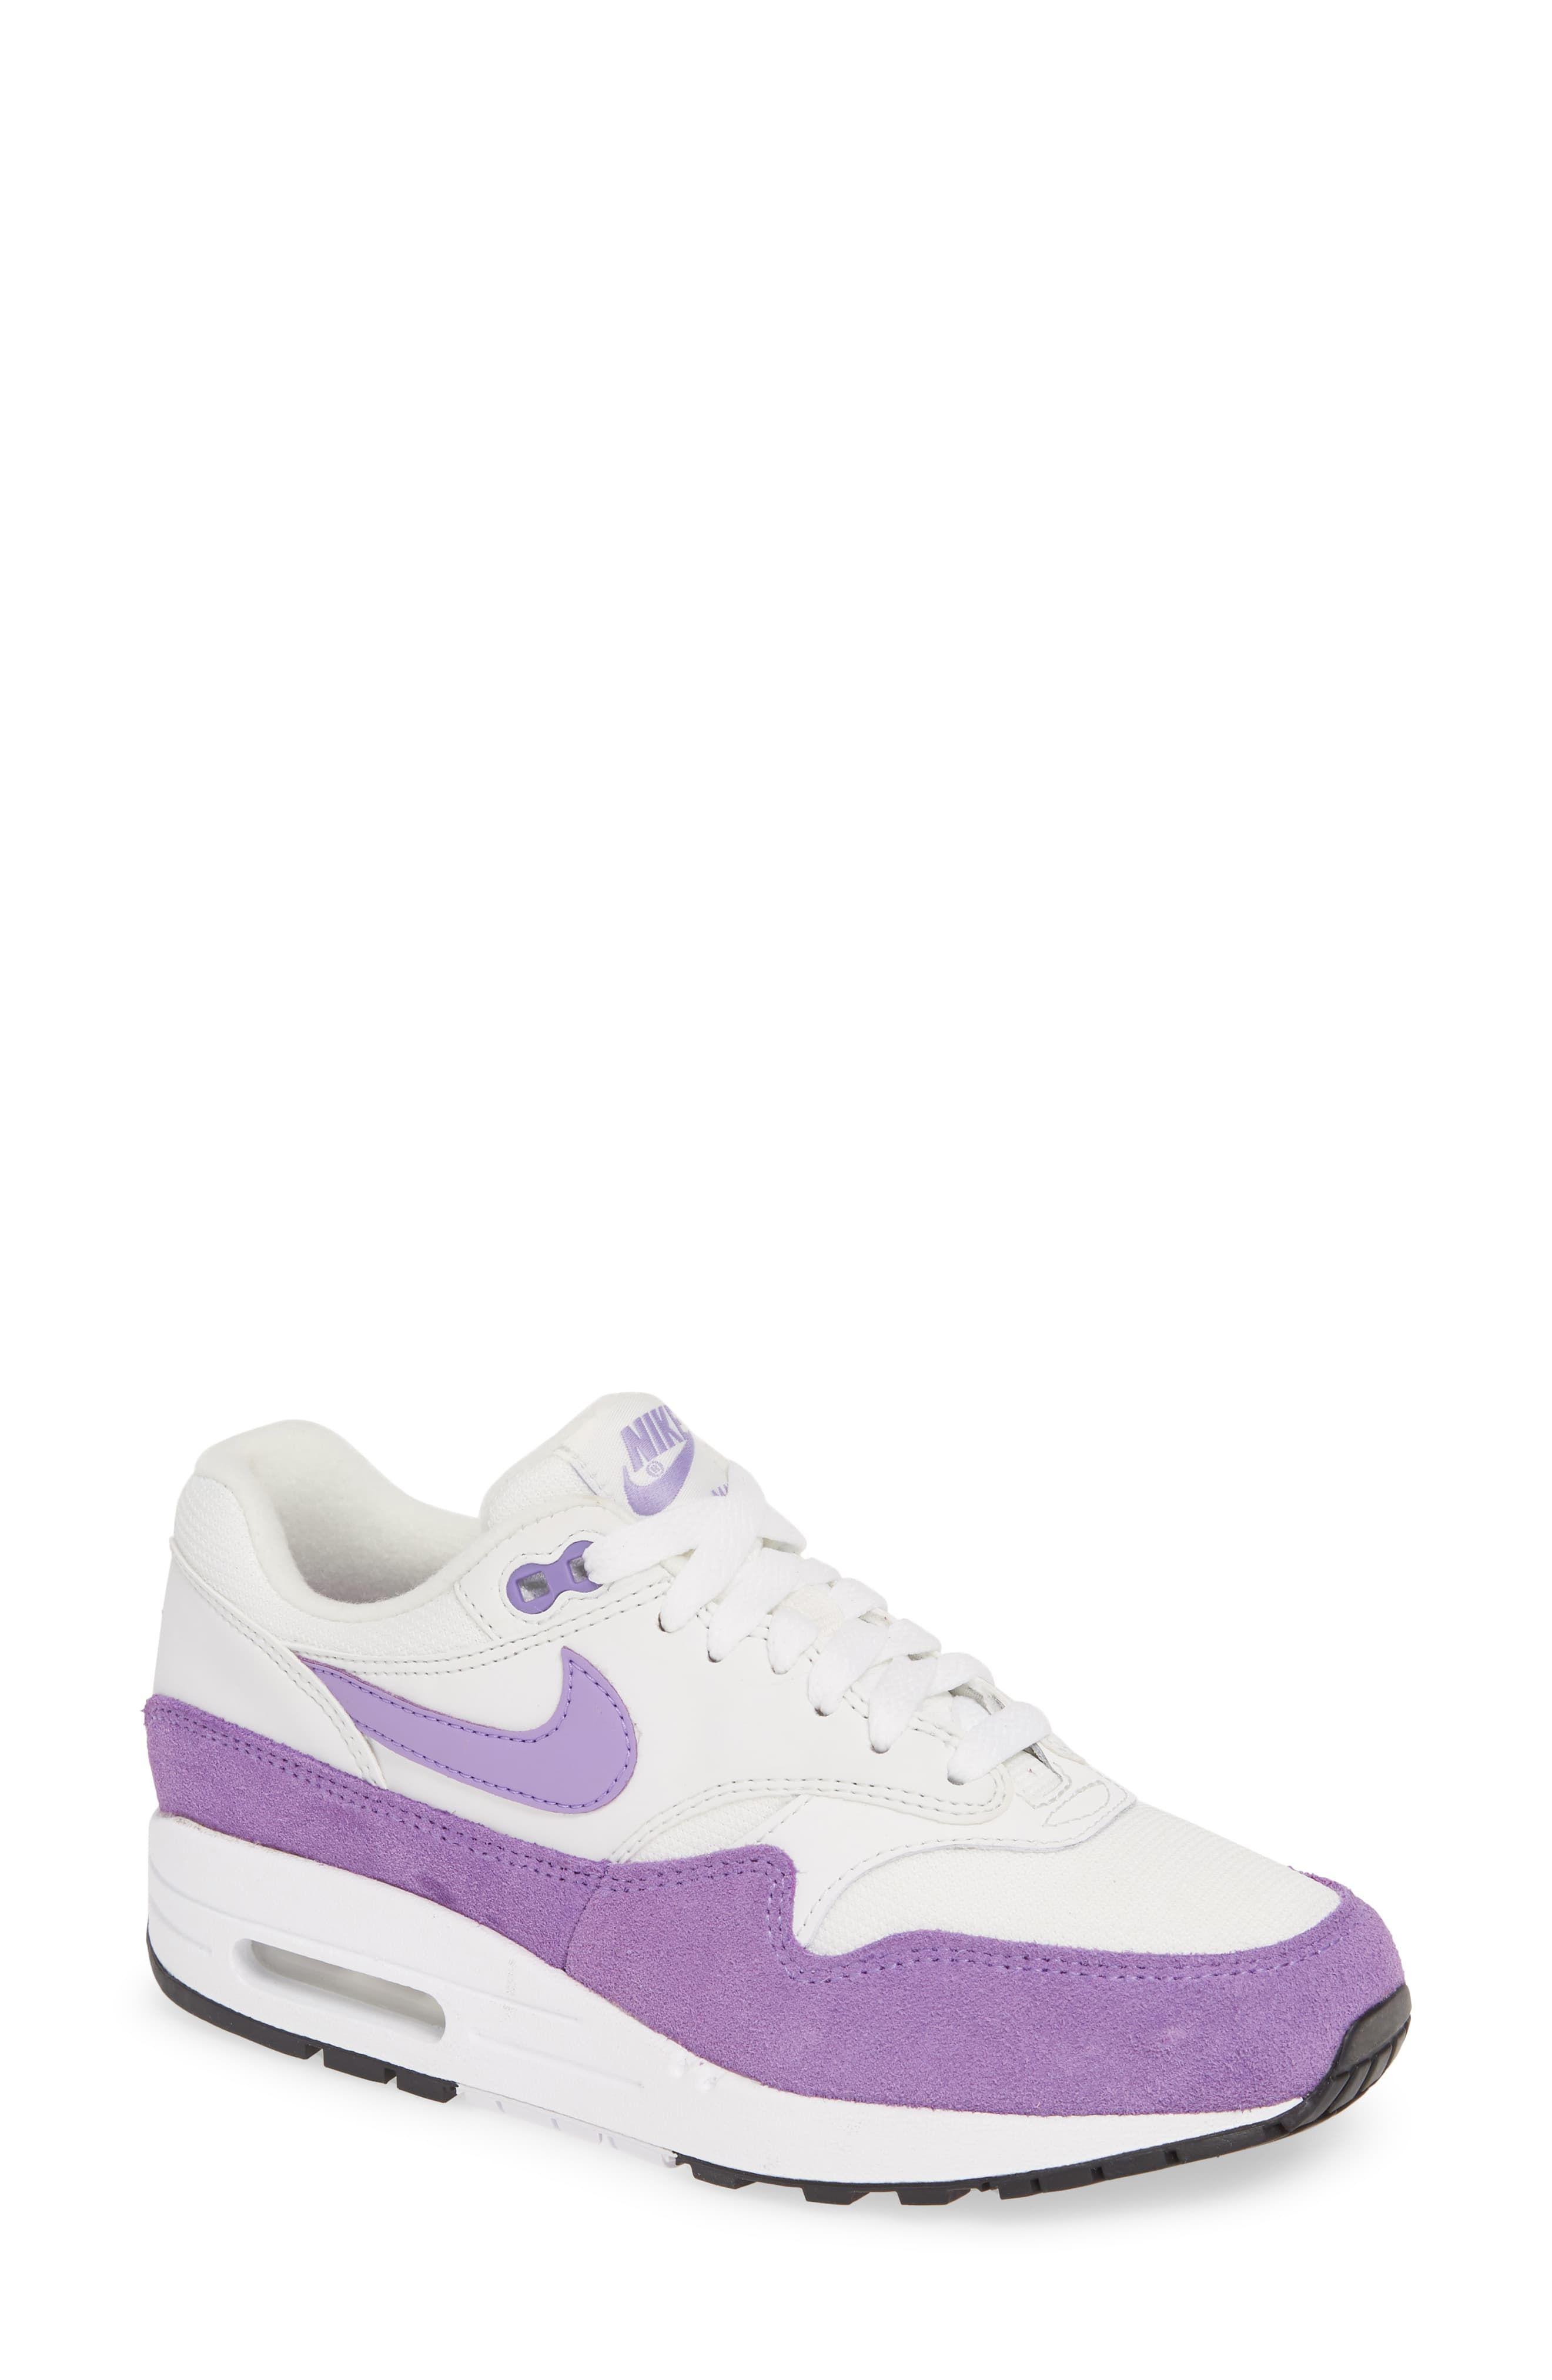 Women's Nike Air Max 1 Nd Sneaker, Size 11 M Black Nike  Nike